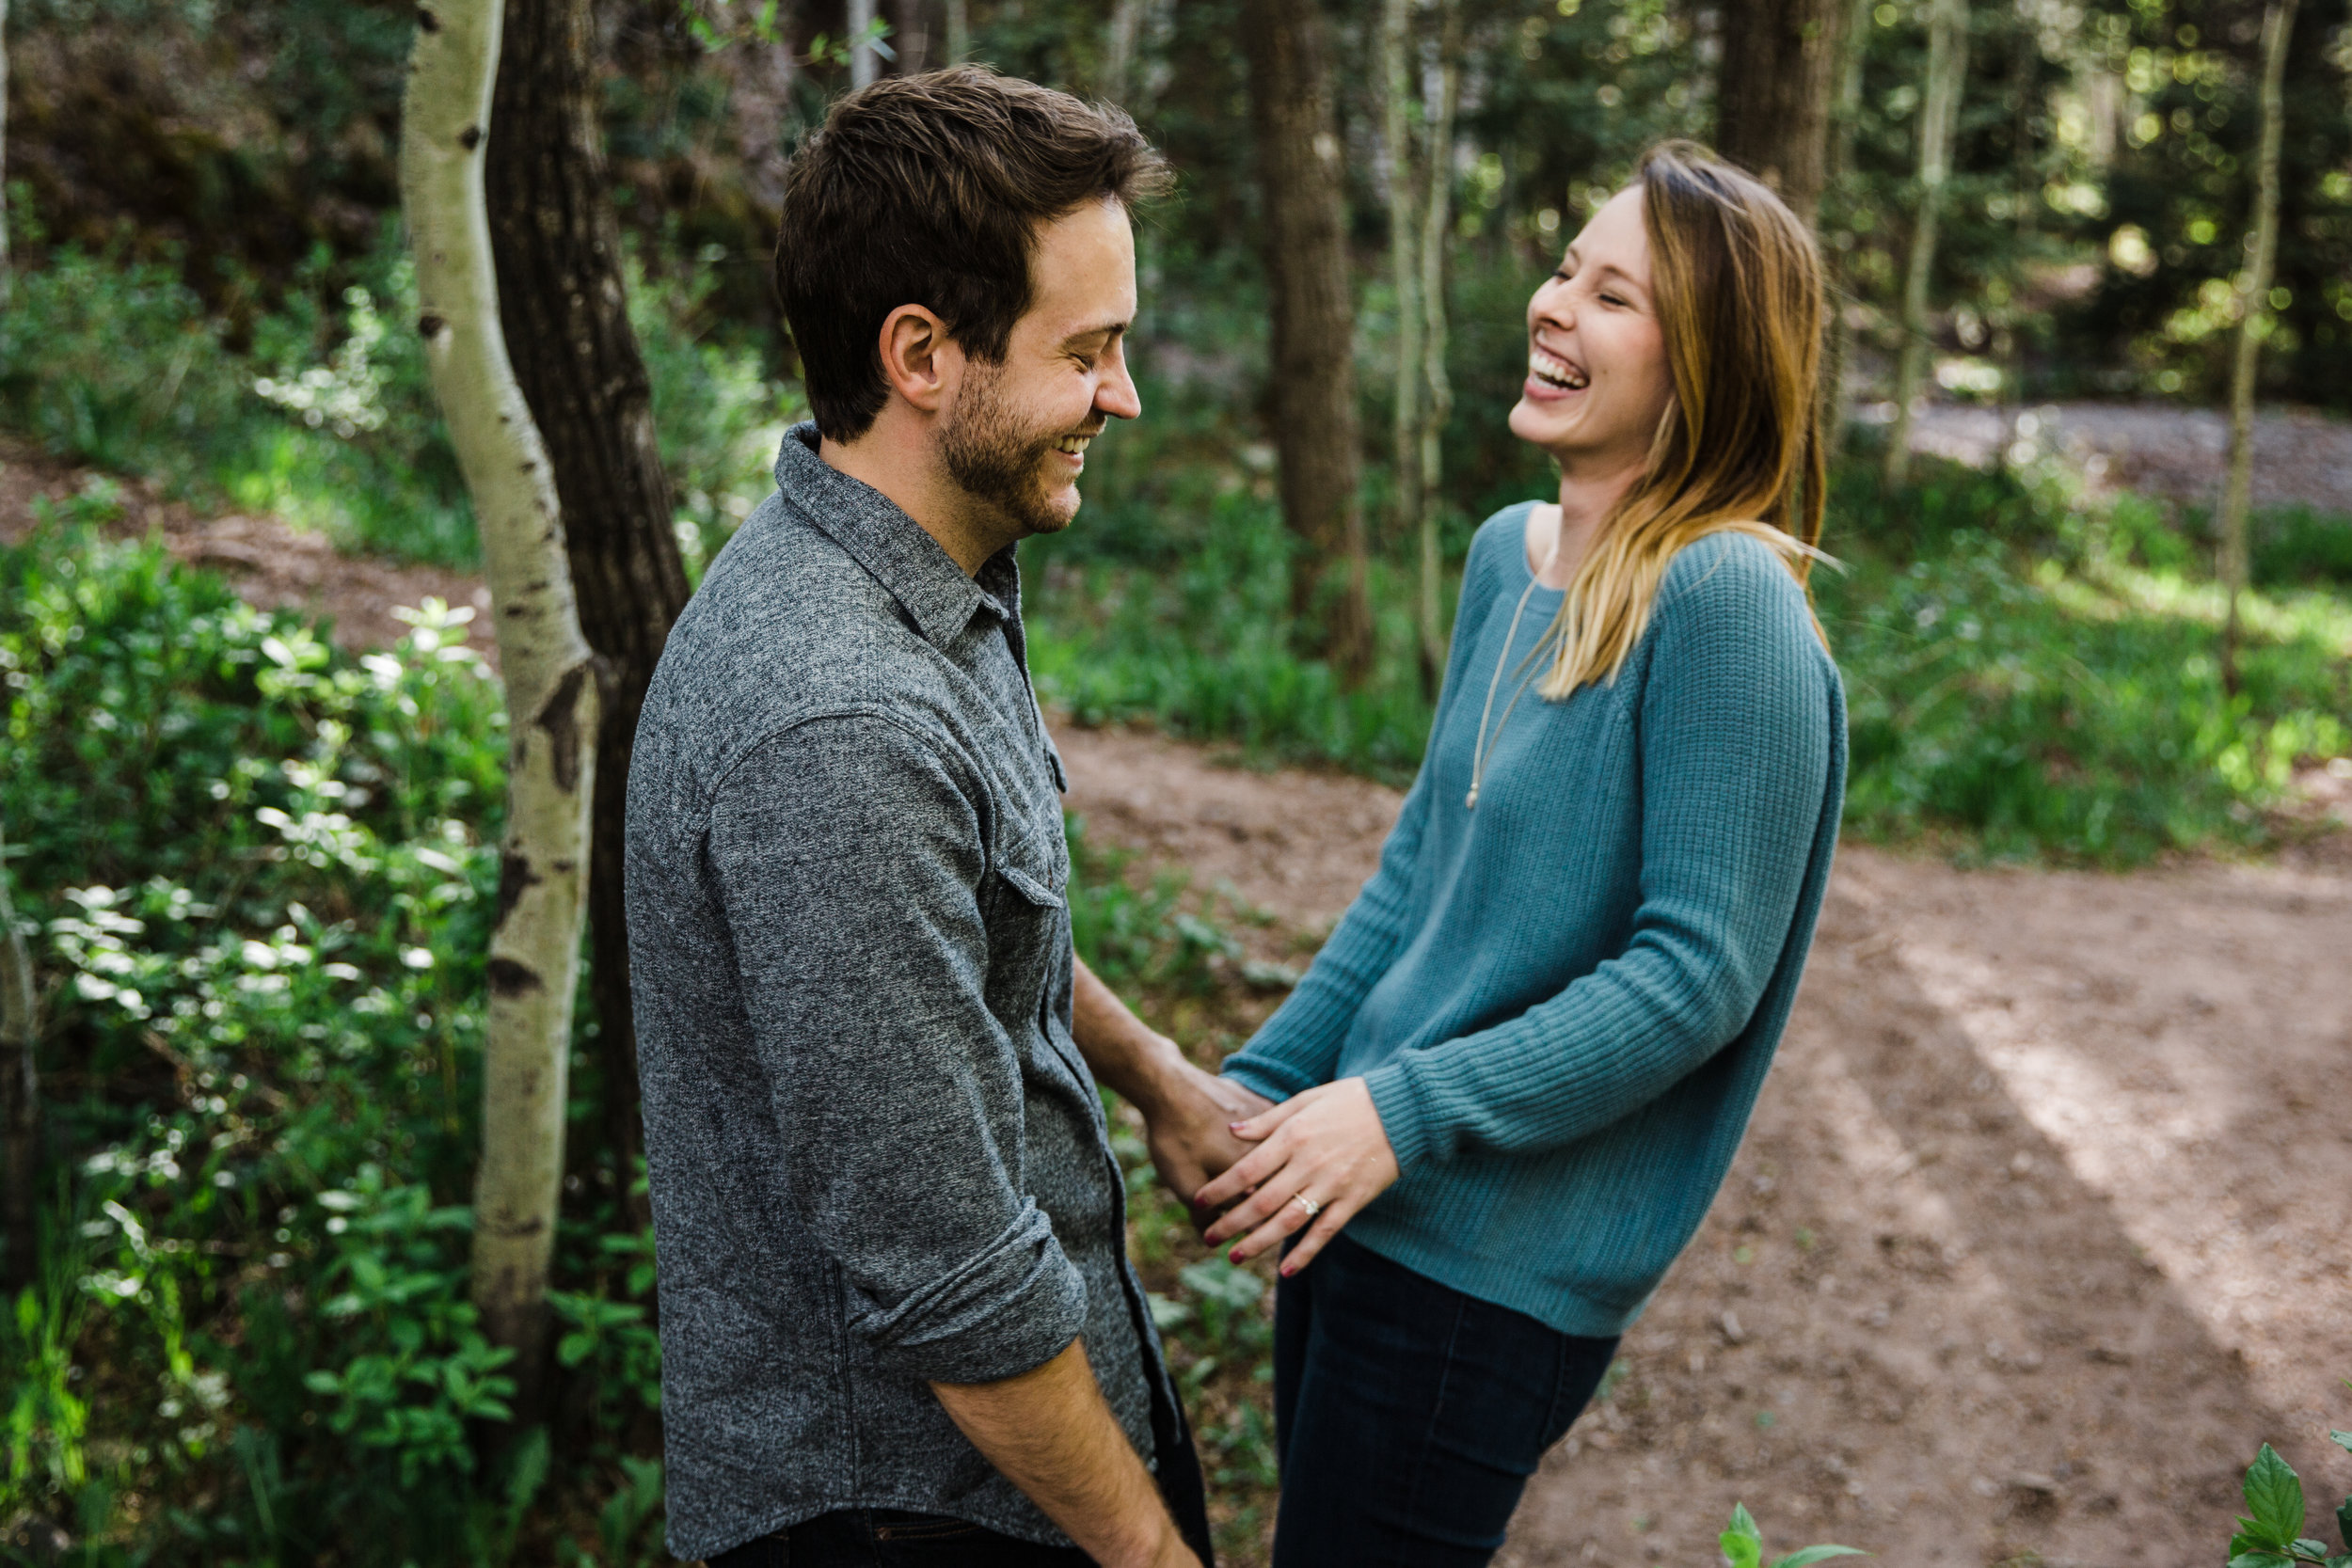 JB-Telluride-Engagement-Photography-Leahandashton-16.jpg